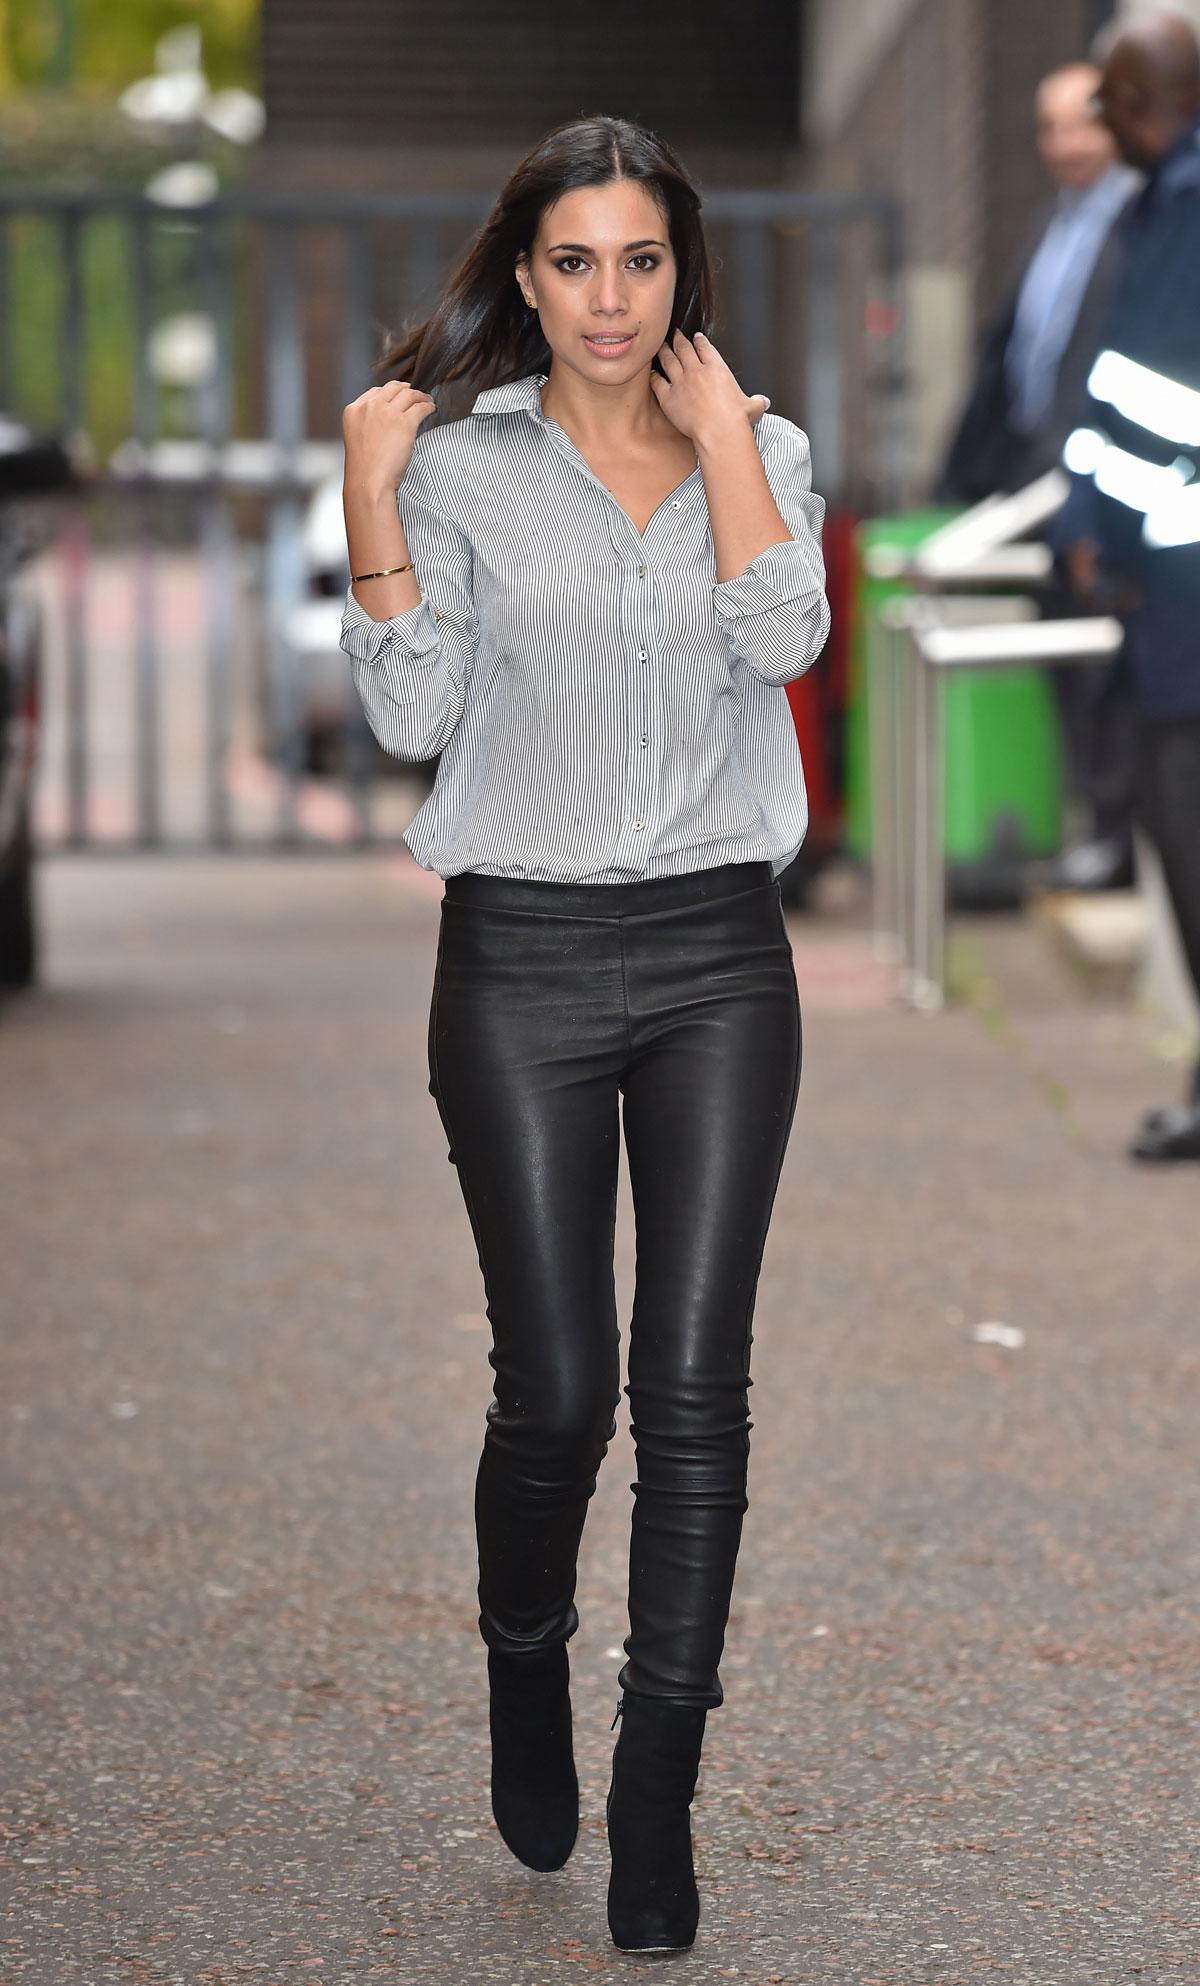 Fiona Wade at ITV Studios